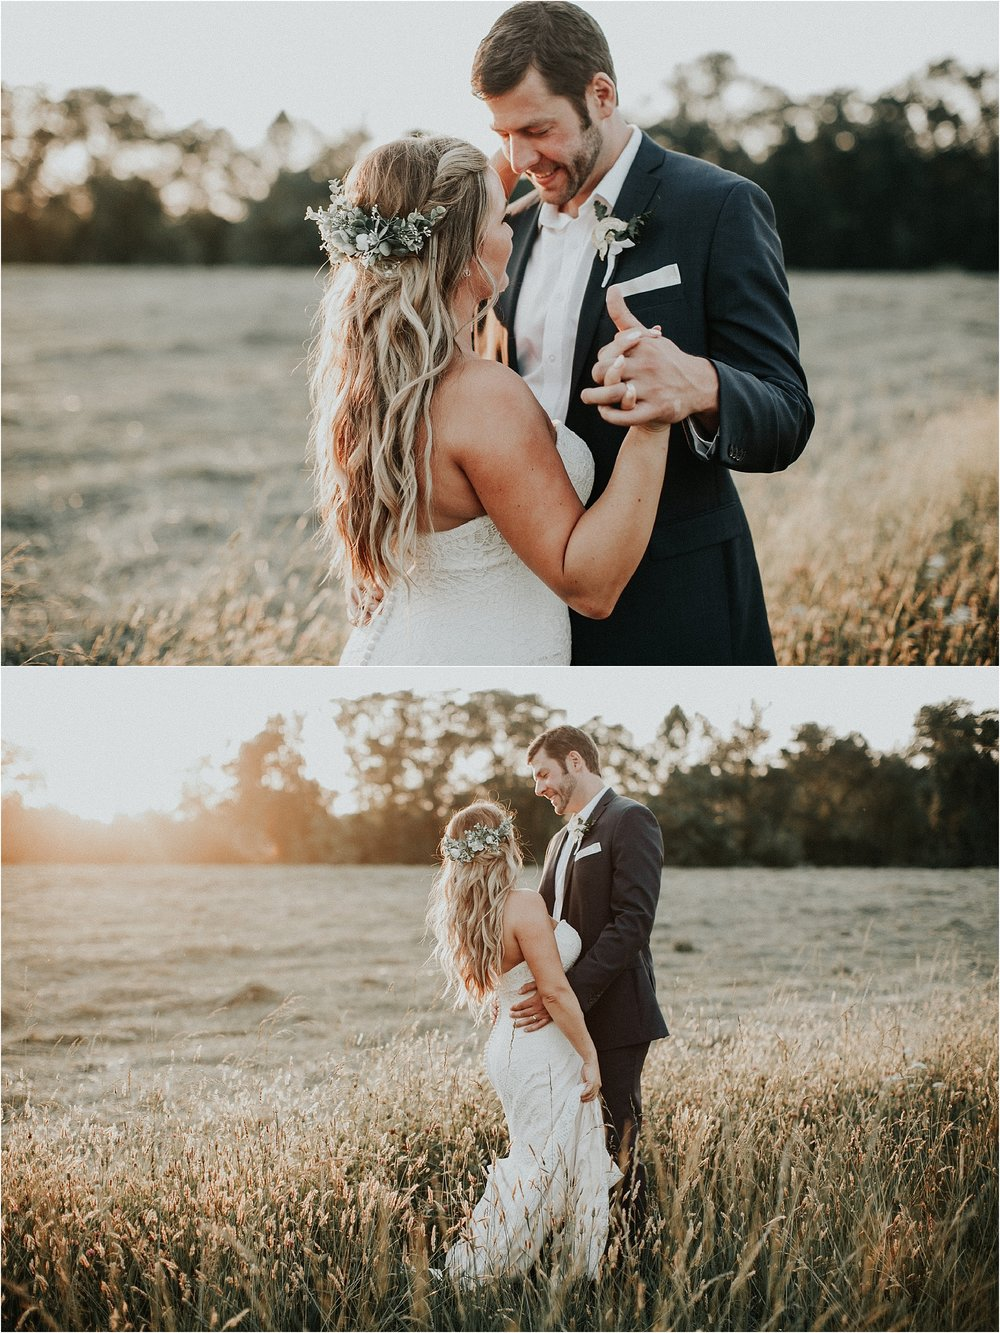 Valenzano_Winery_NJ_Wedding_Photographer_0048.jpg